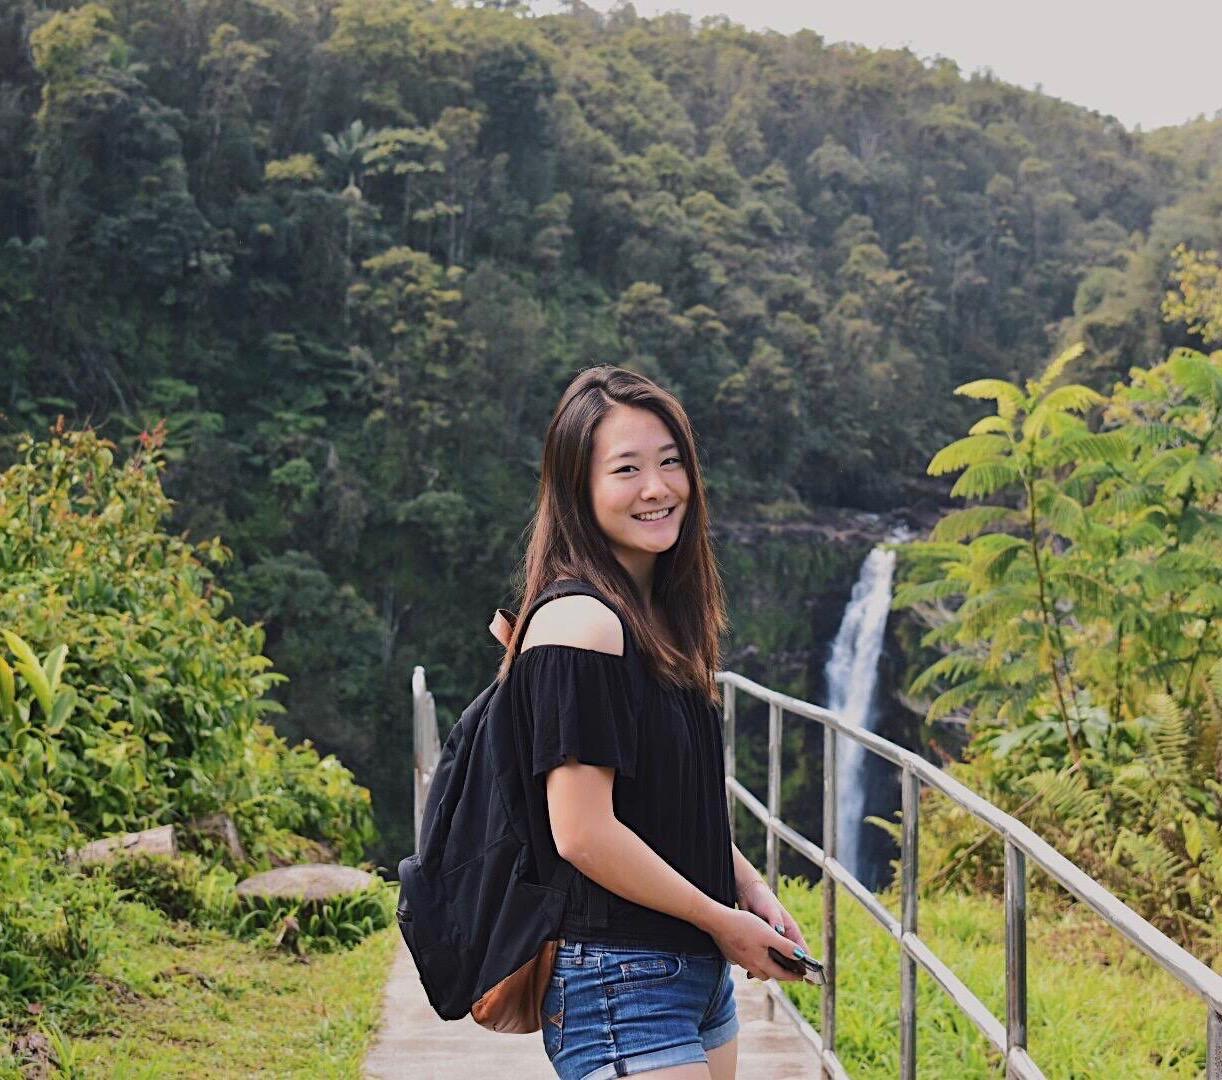 Yui Hashiyada